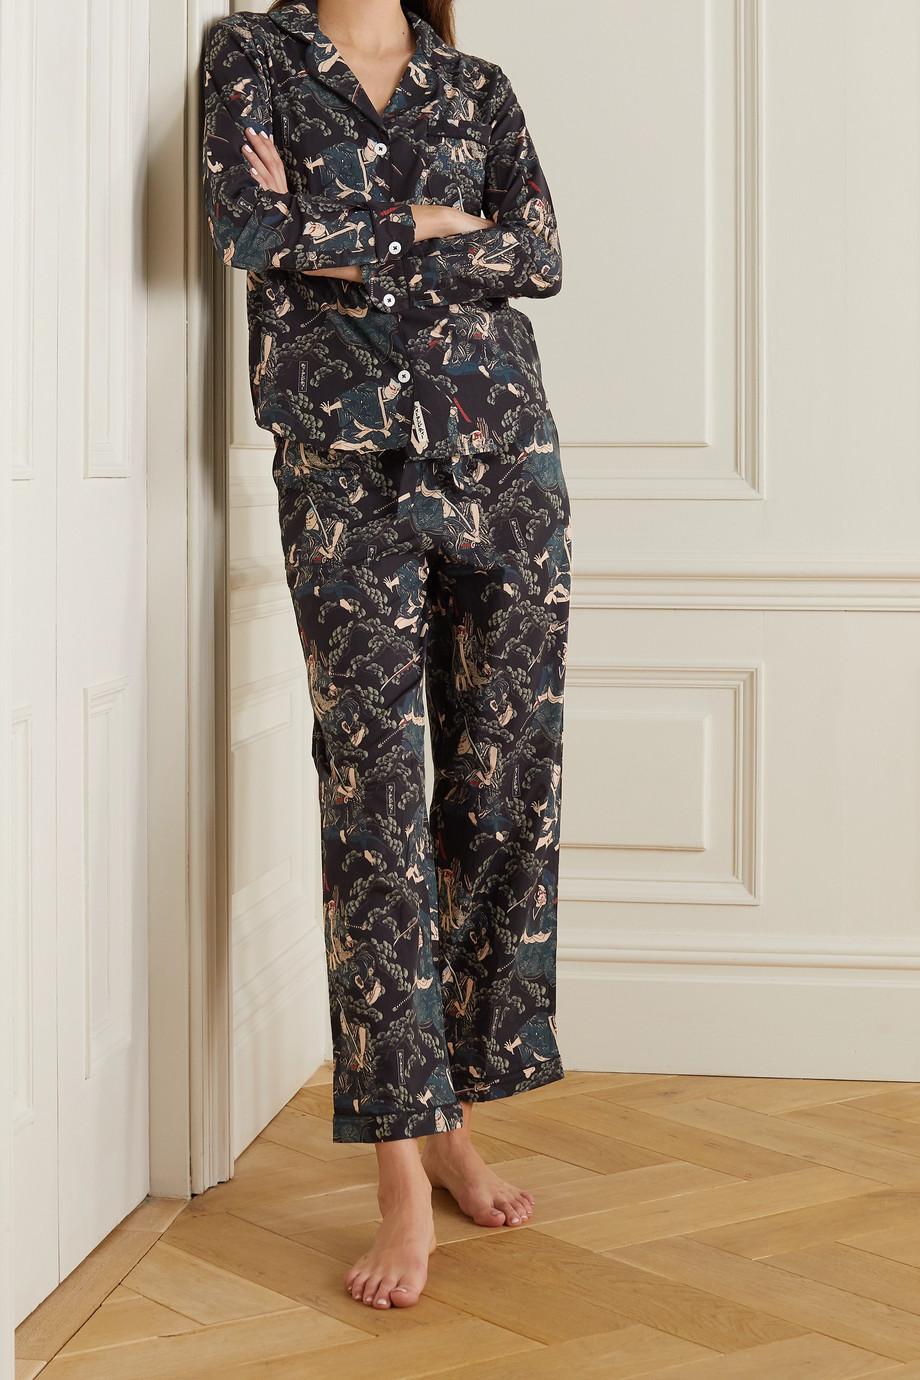 Desmond & Dempsey + Rie Takeda printed organic cotton pajama set